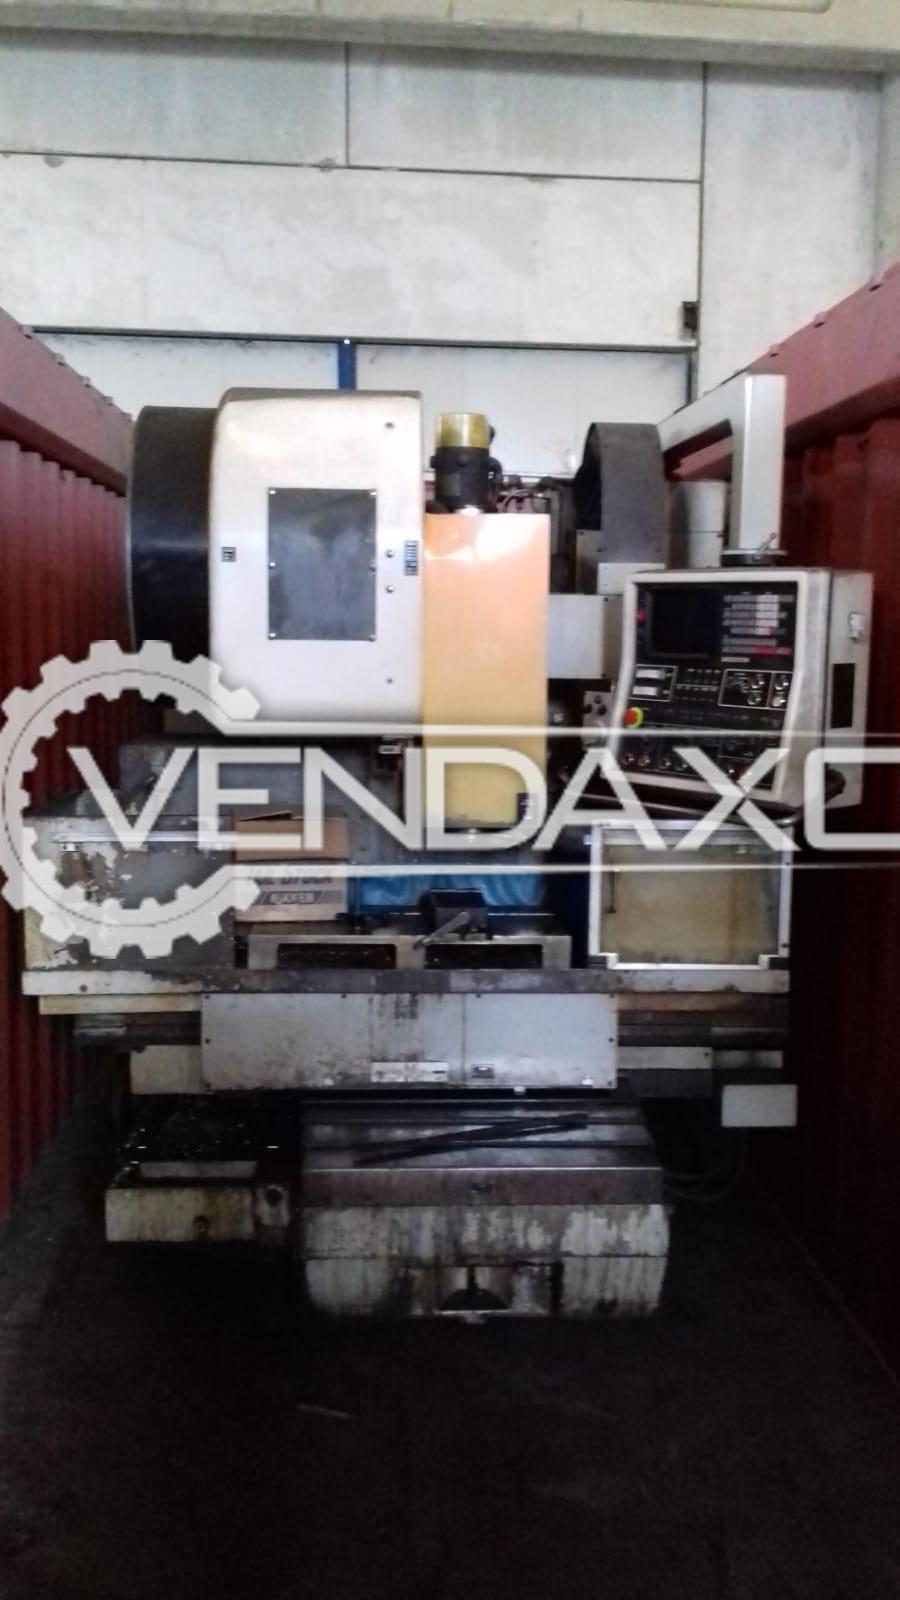 Mori Seiki Make CNC Vertical Machining Center - VMC - Table Size : 700 x 450 mm